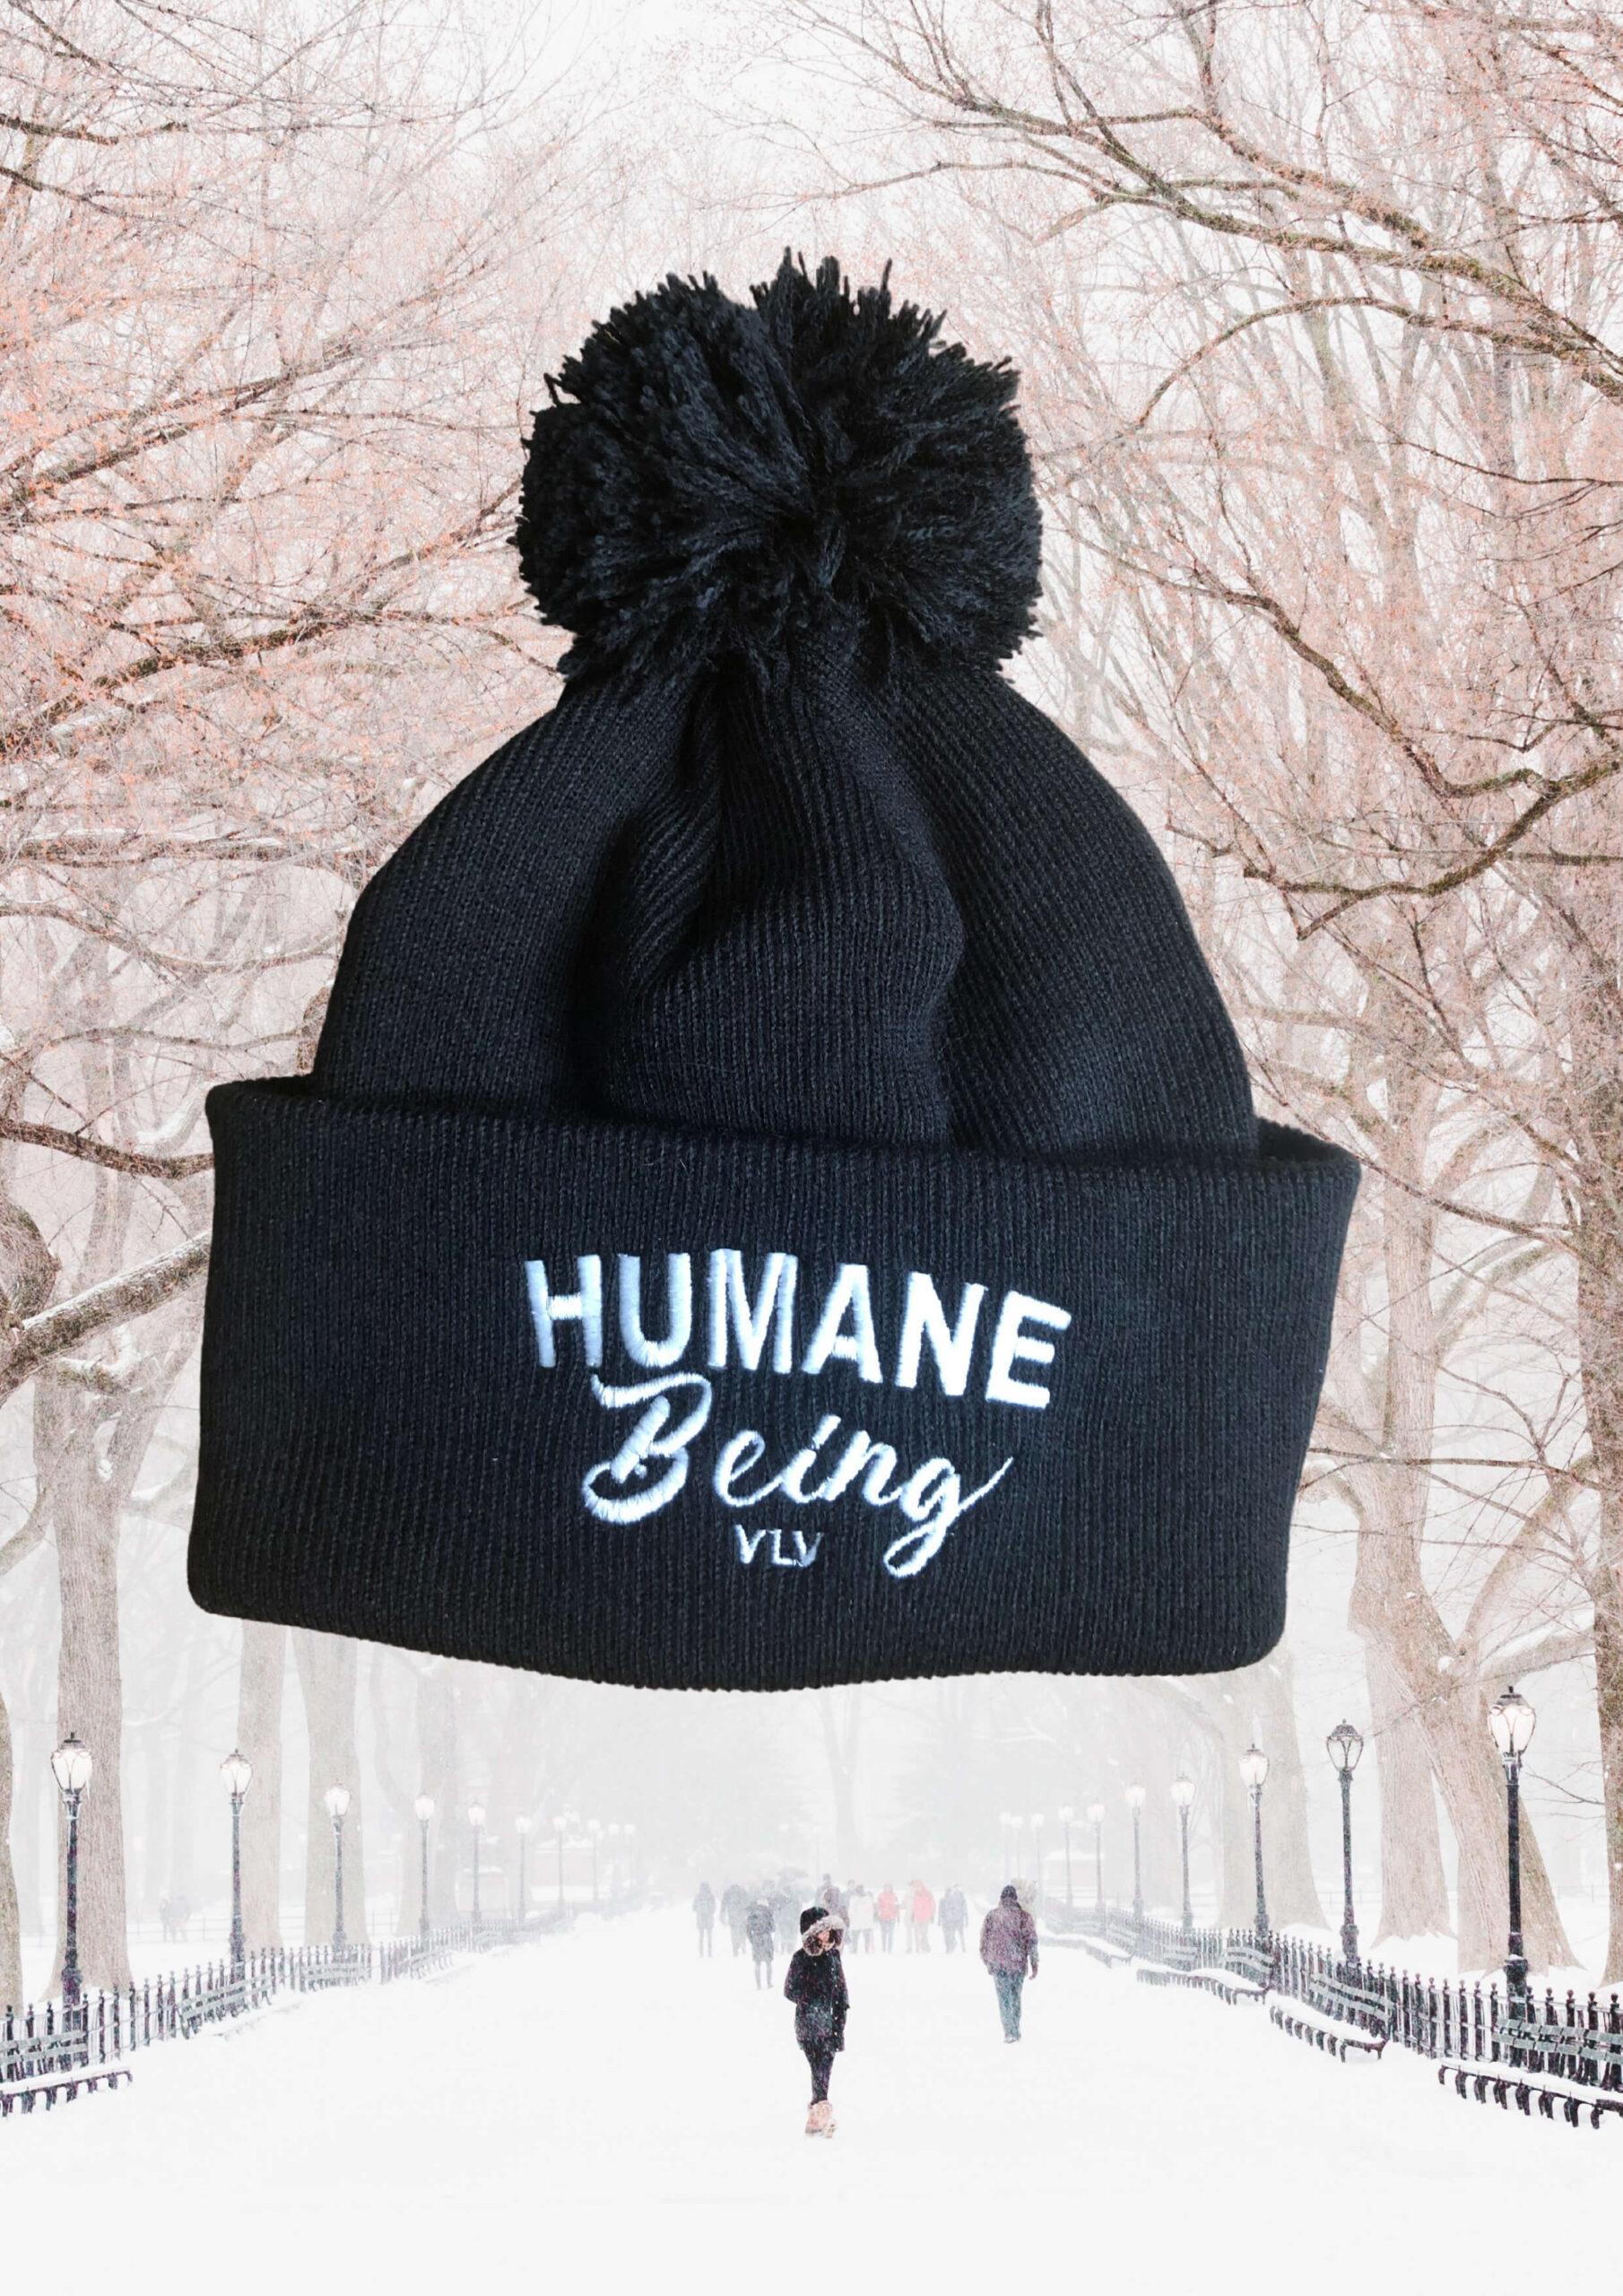 Humane Being Embroidered pom pom beanie by eco ethical brand Viva La Vegan